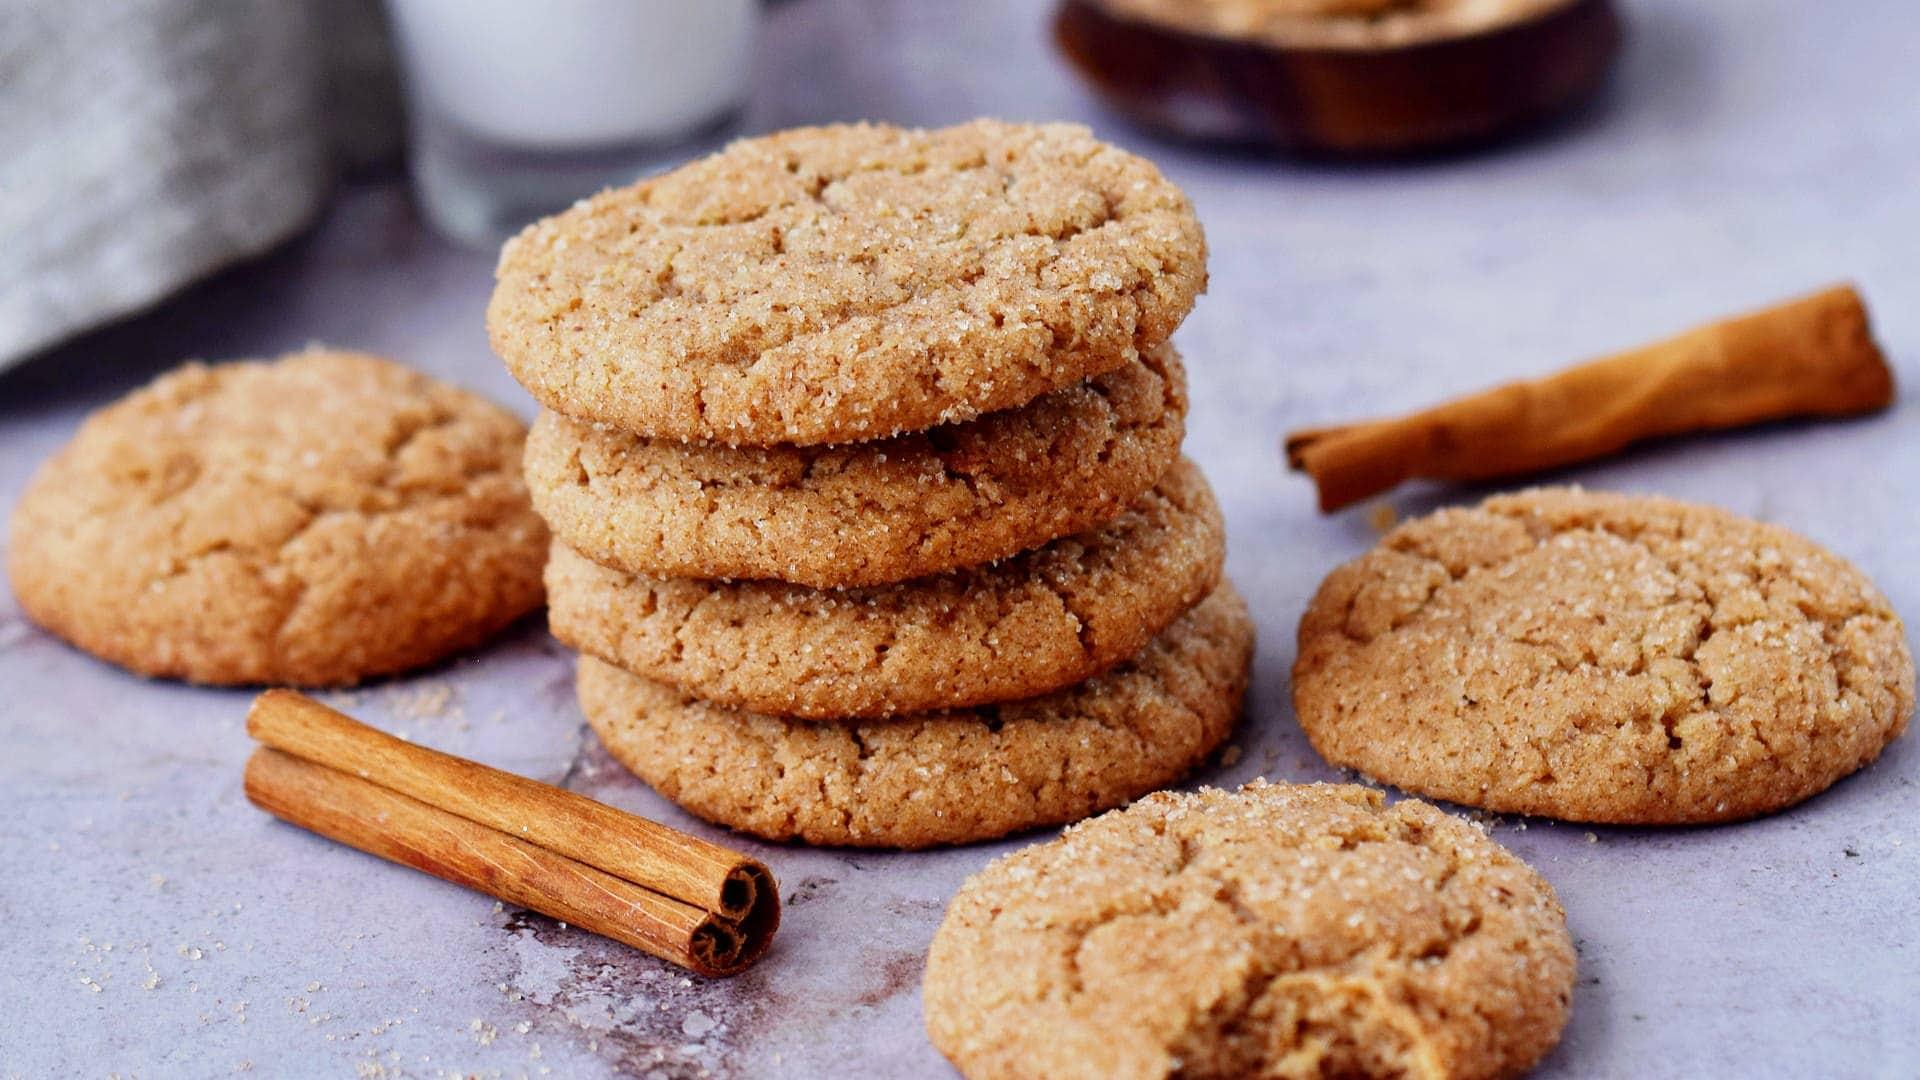 vegan snickerdoodles with cinnamon sticks